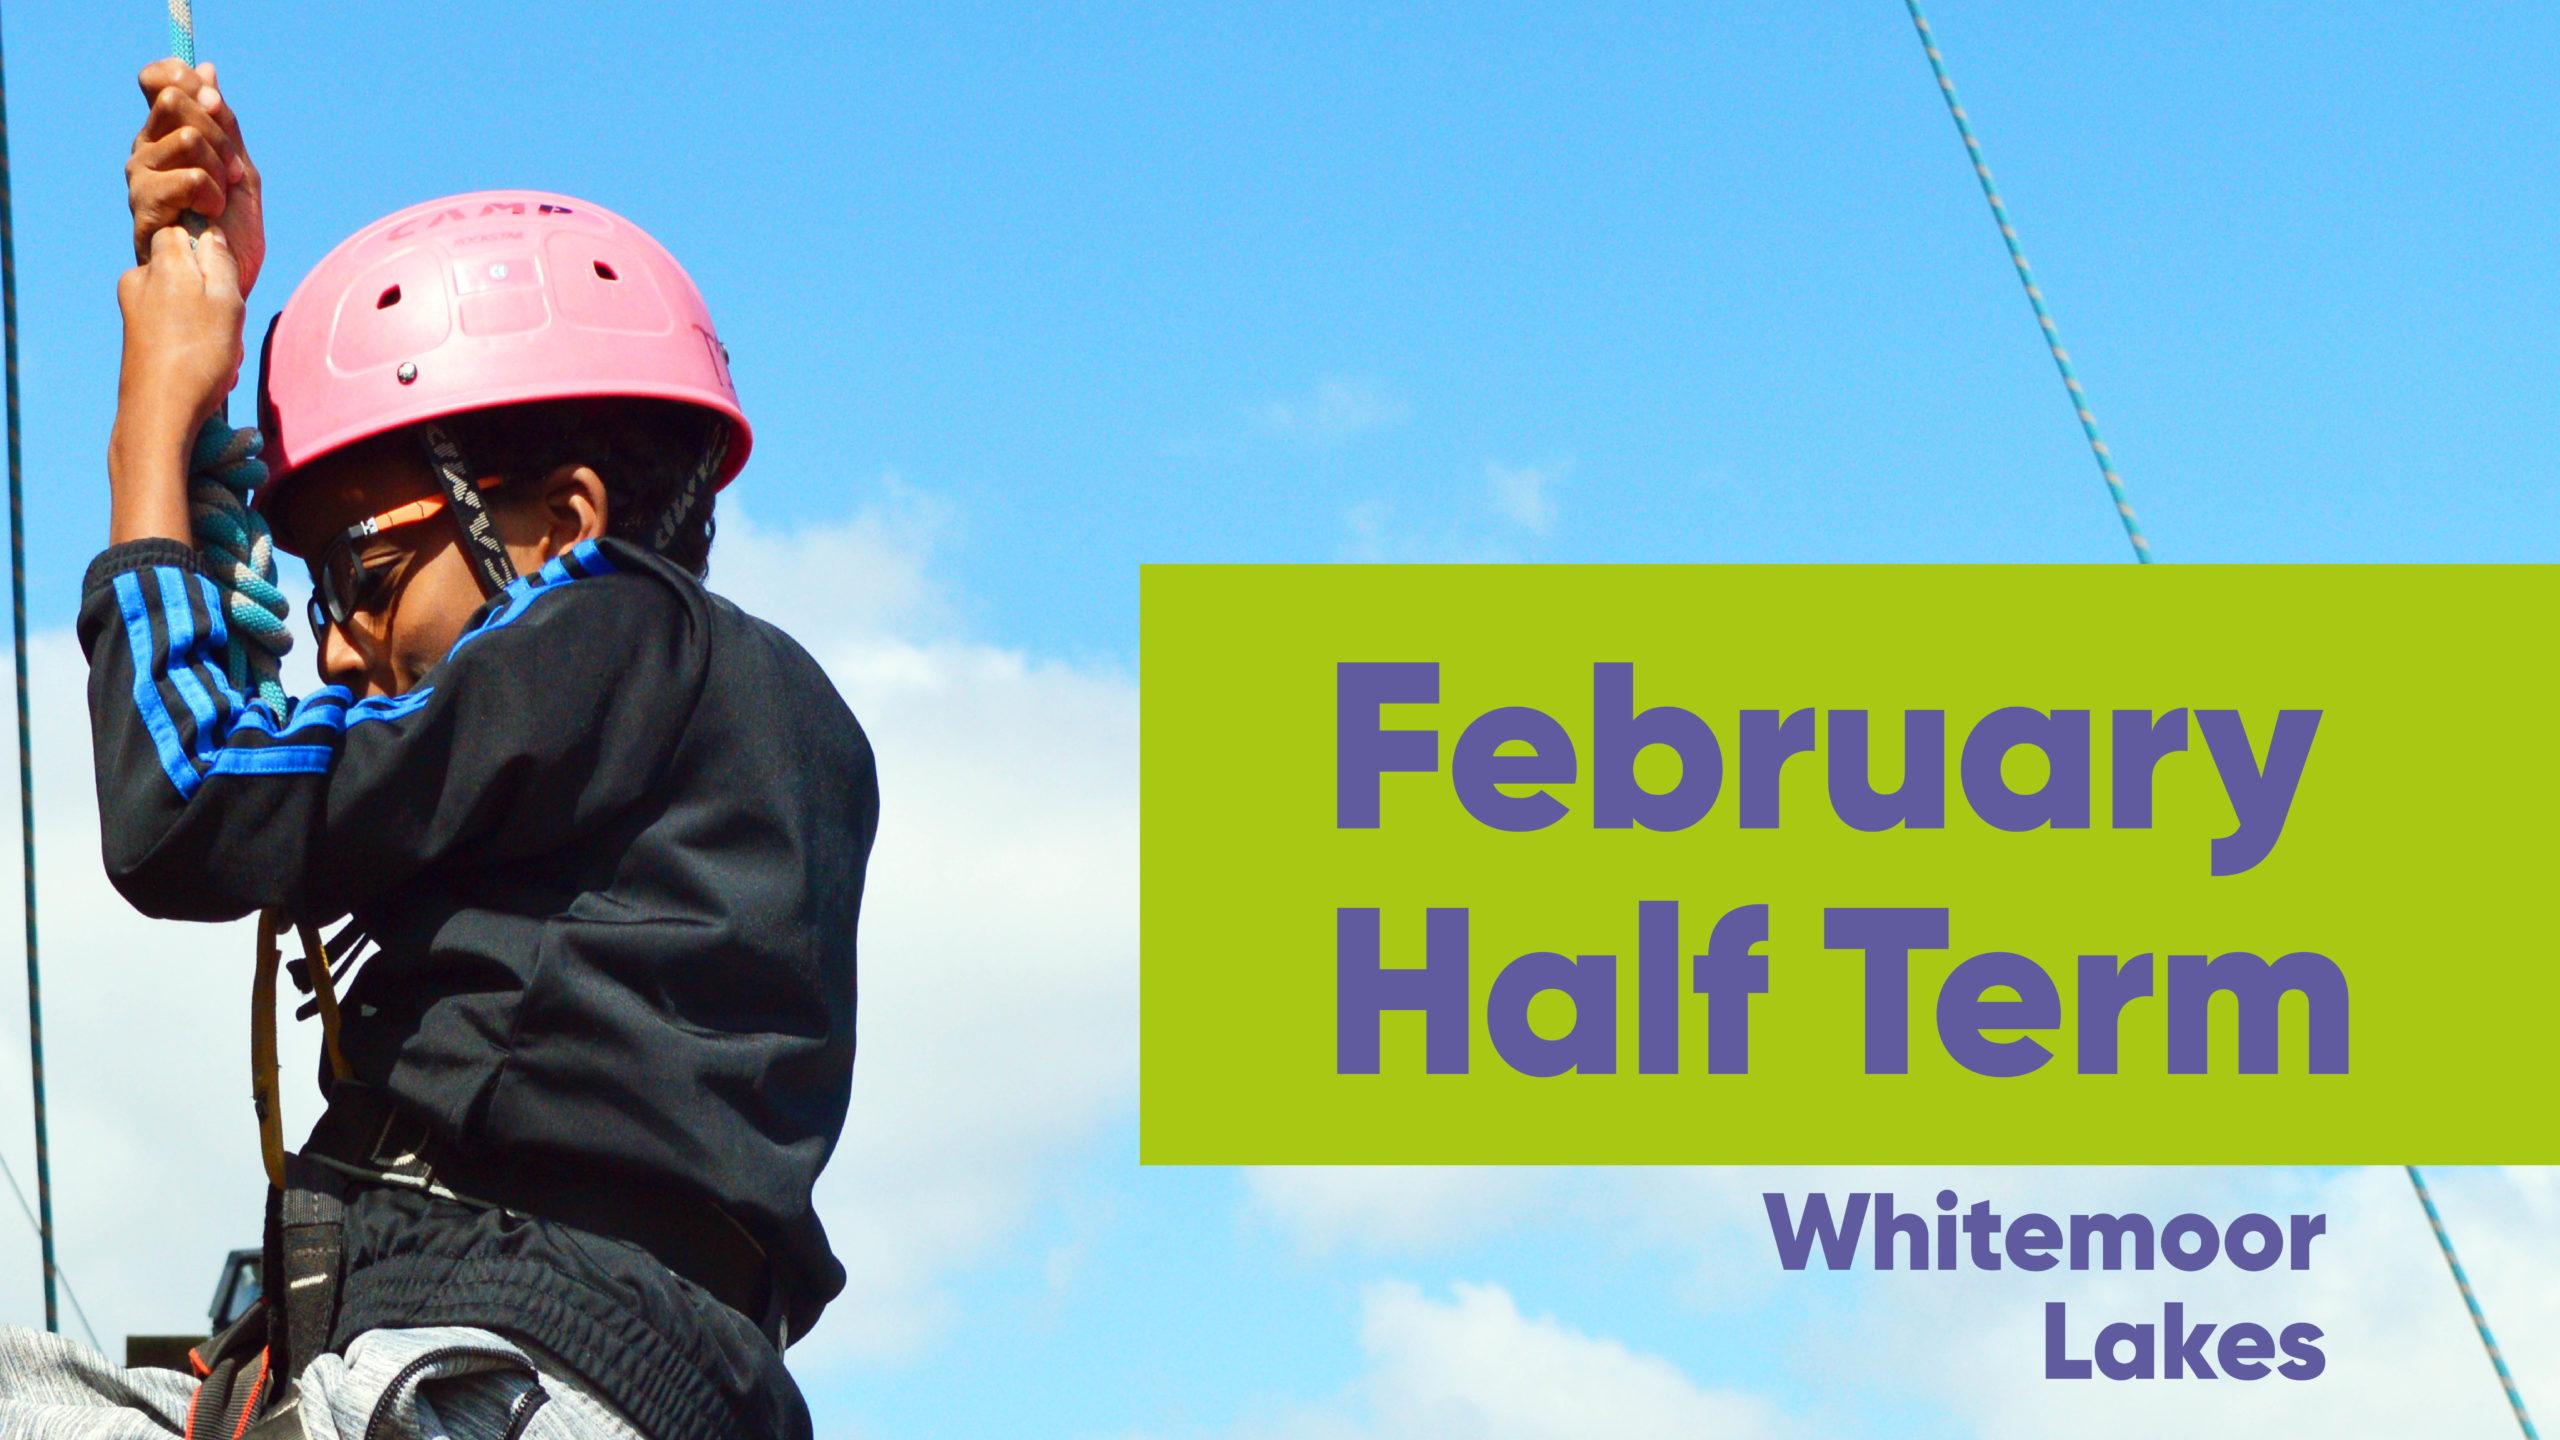 February Half Term - Youth Climbing a Wall